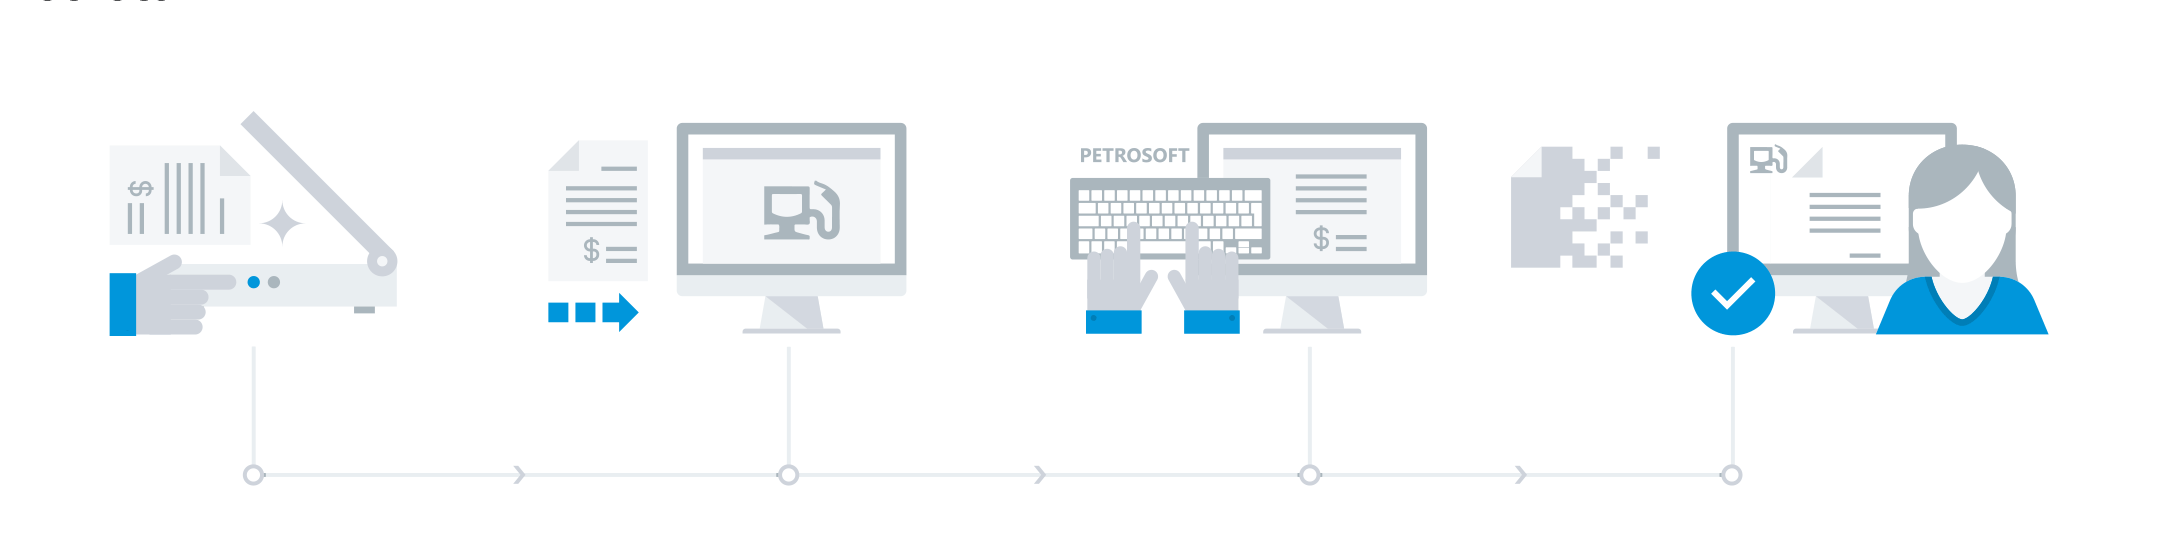 edi and retail invoice processing services petrosoft